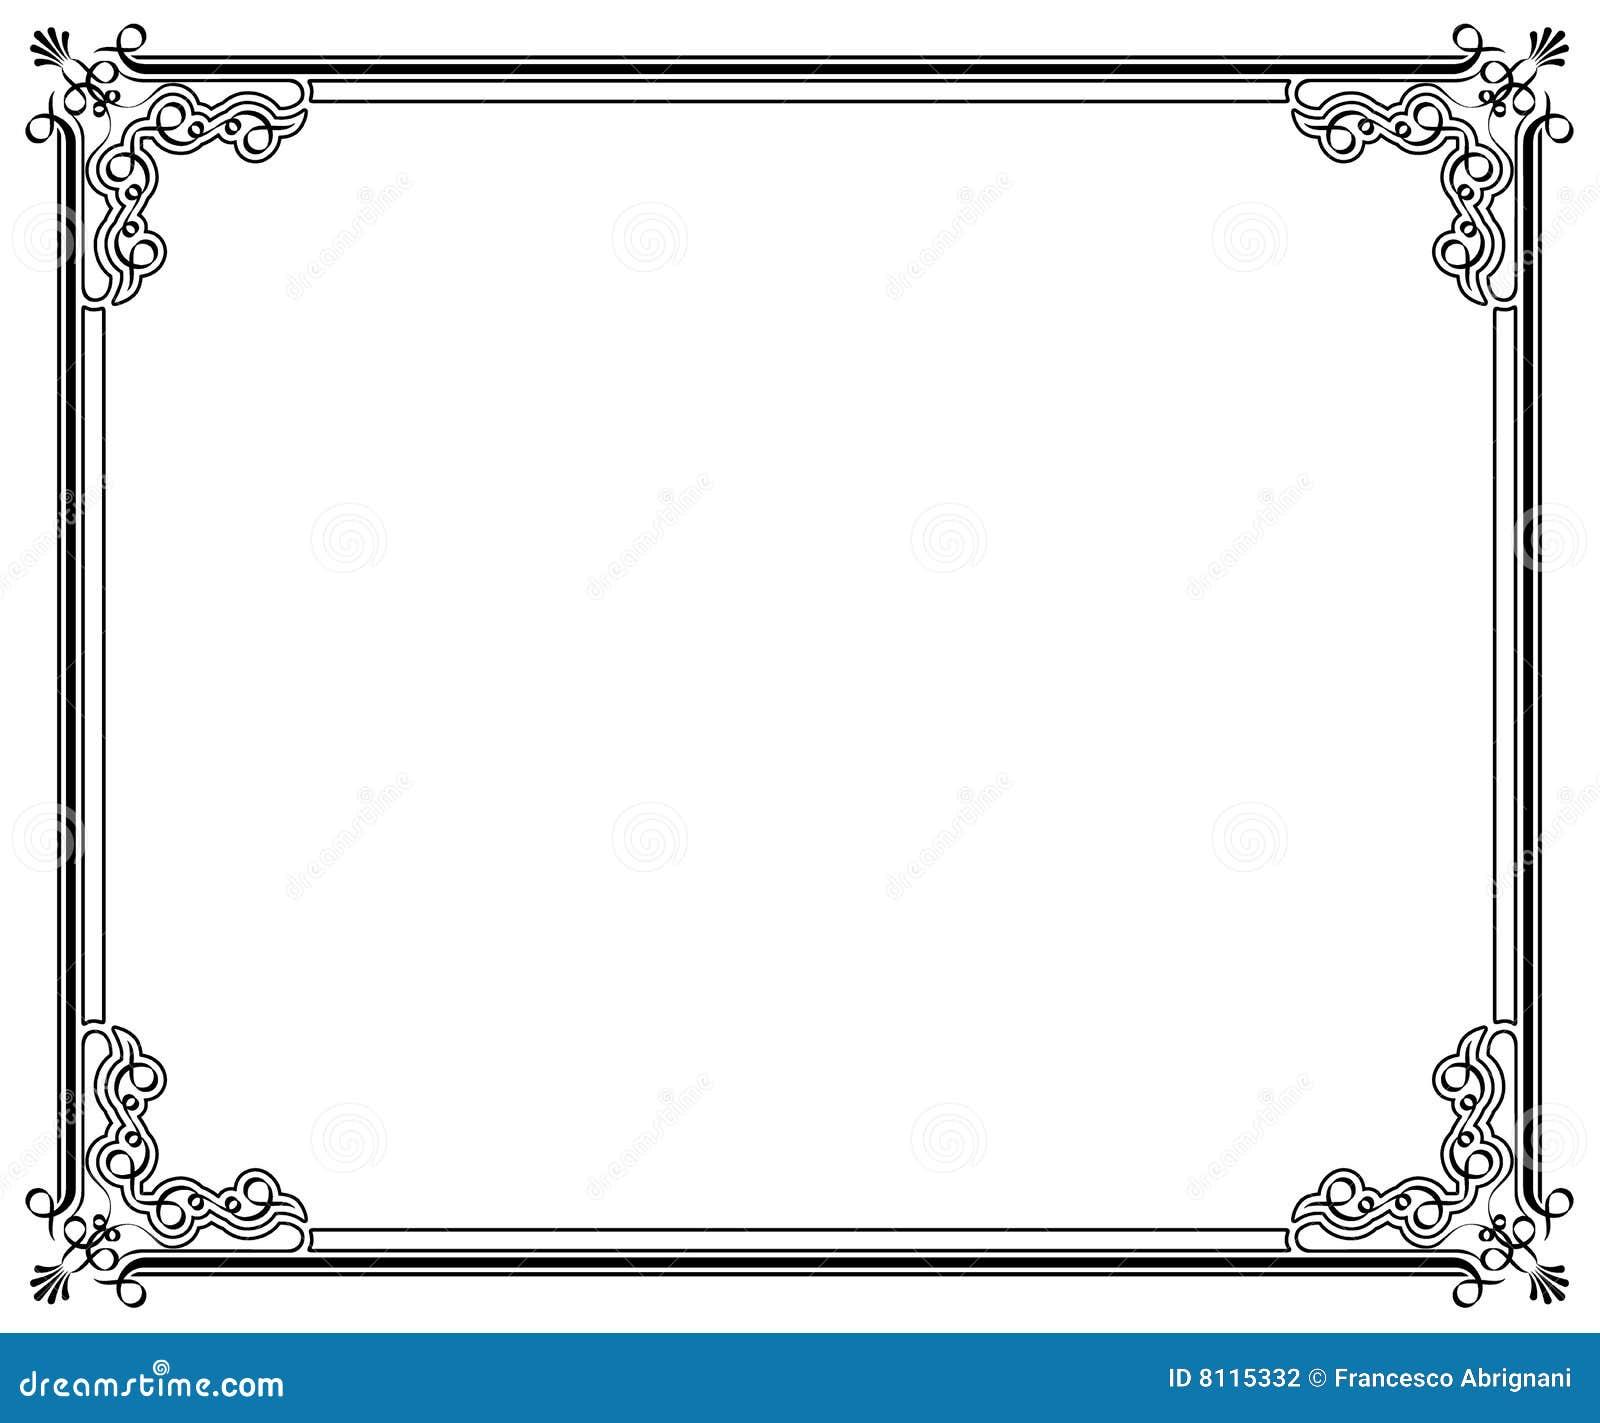 elegant page corner borders